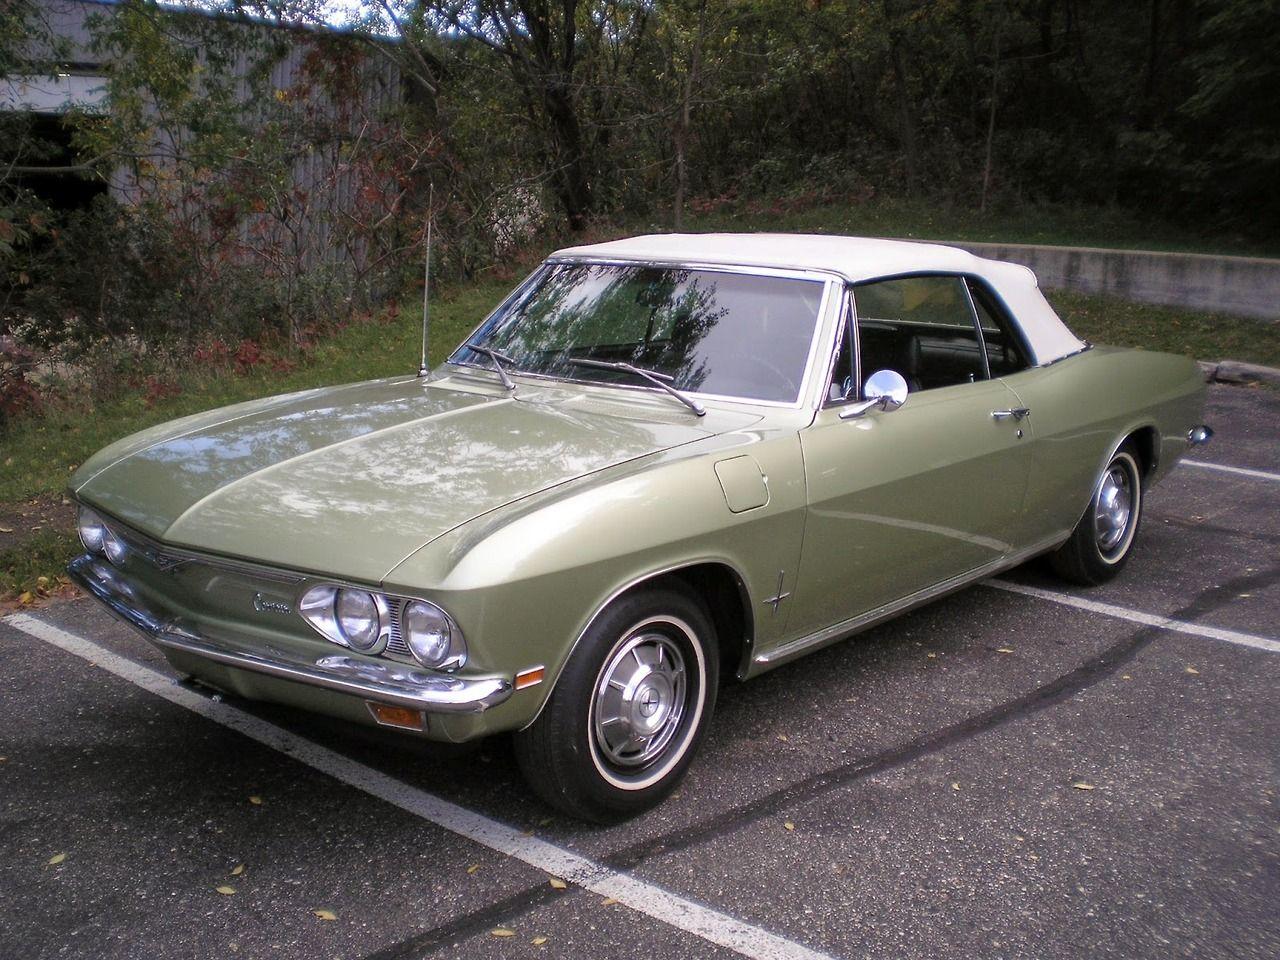 1969 Chevrolet Corvair Monza Convertible Chevrolet Corvair Chevy Corvair Chevrolet